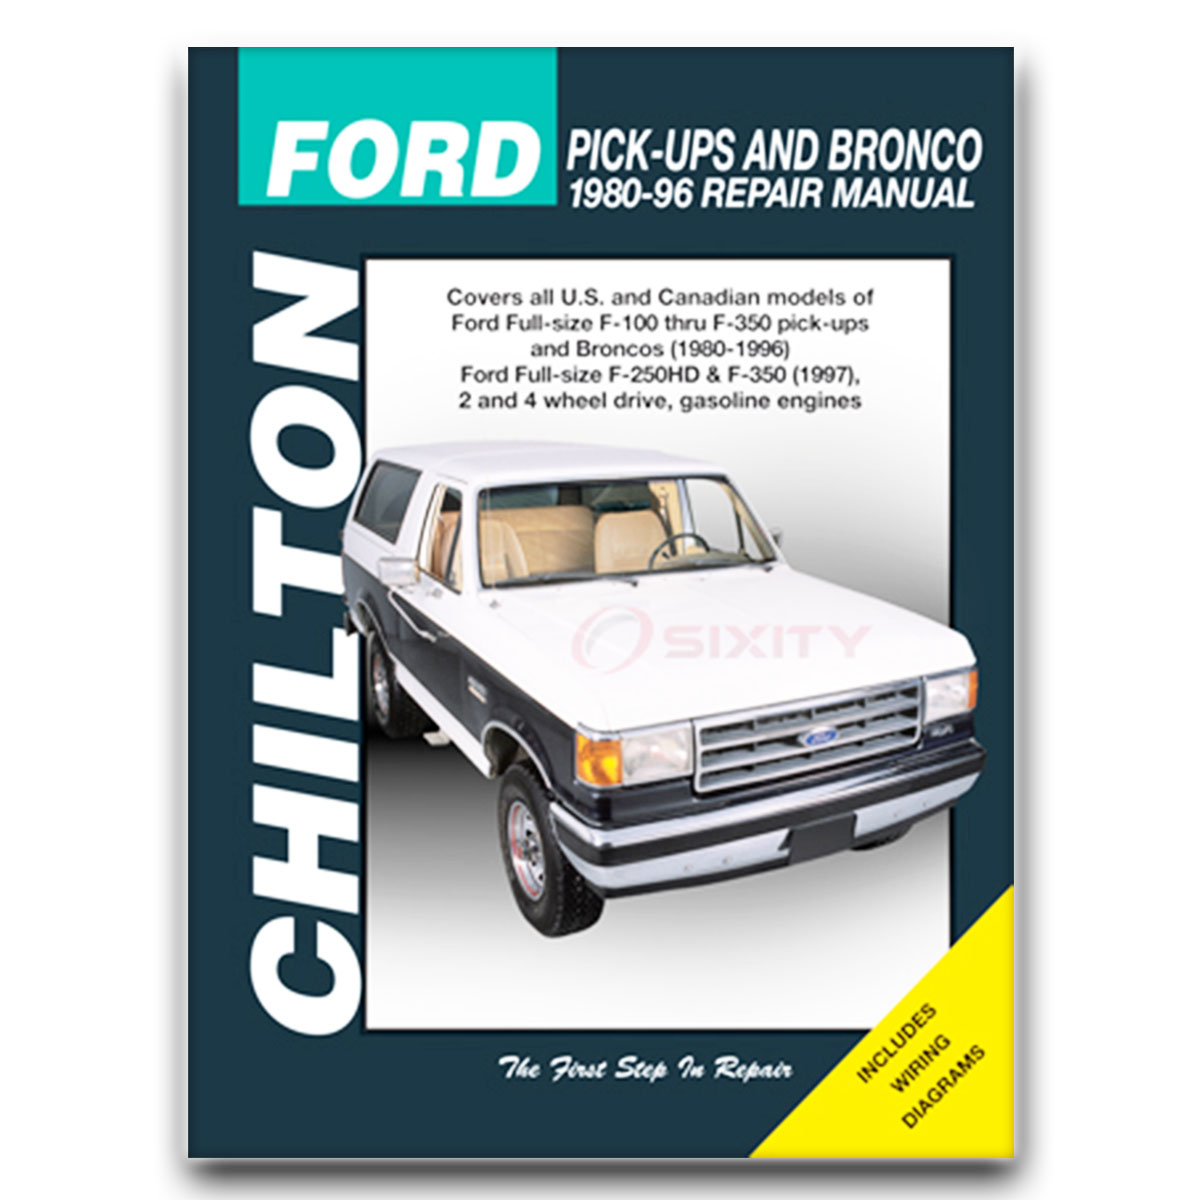 Chilton Repair Manual for Ford F-250 Eddie Bauer Custom XLT Special Lariat  hm